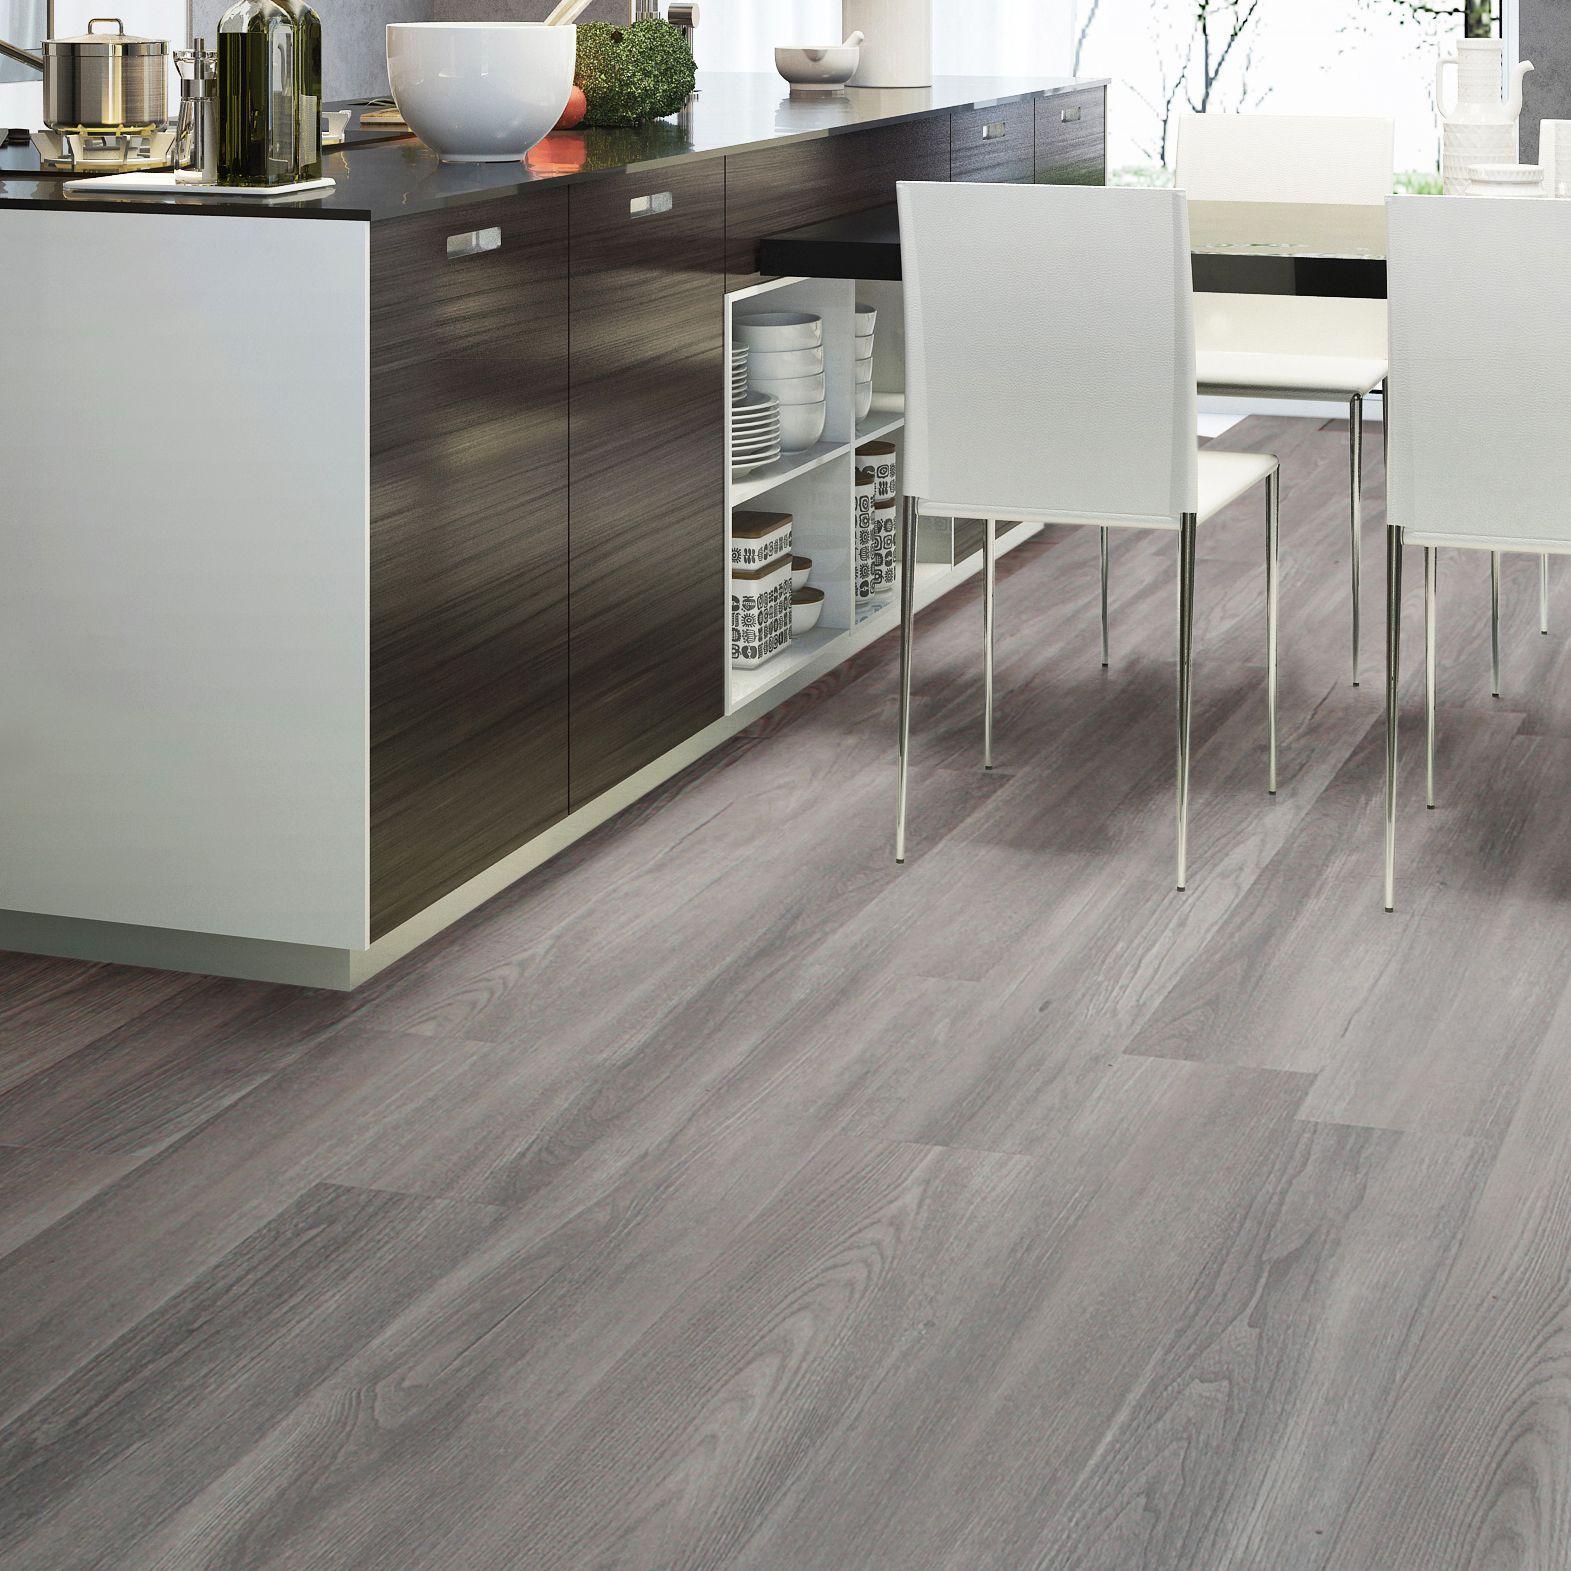 Grey natural oak effect waterproof luxury vinyl click flooring grey natural oak effect waterproof luxury vinyl click flooring sample dailygadgetfo Image collections